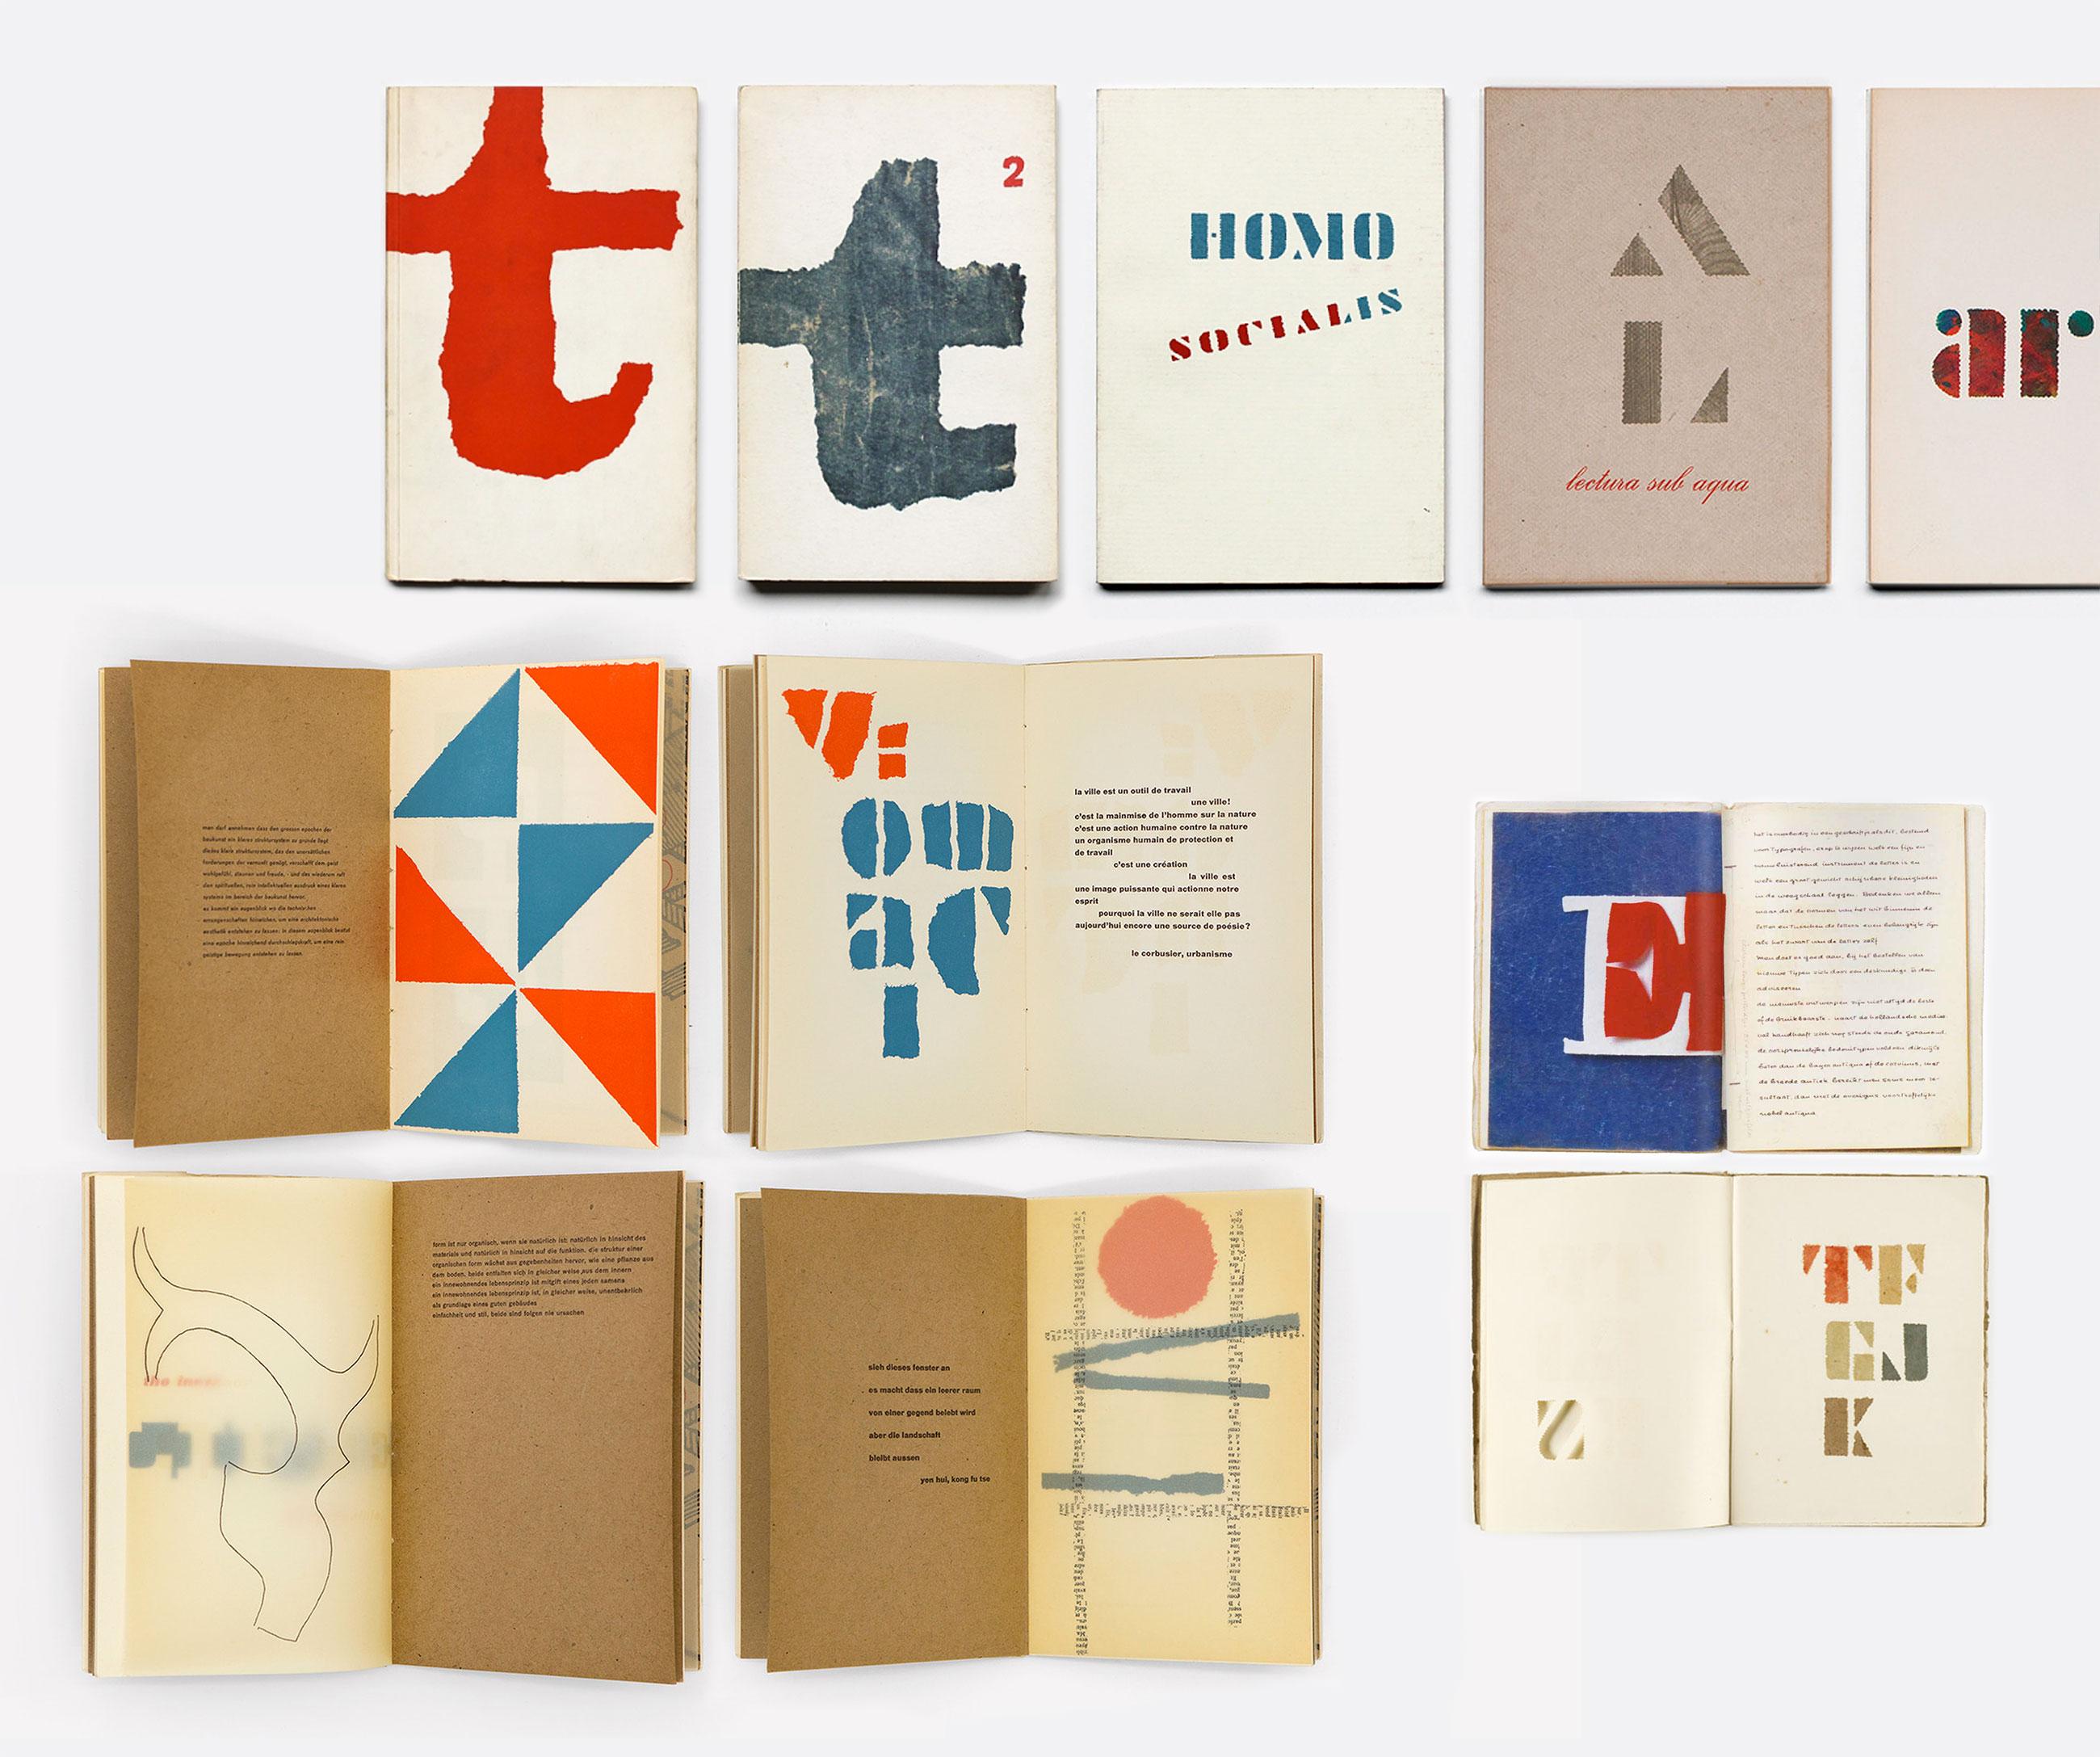 Willem-Sandberg-experimenta-typografica-montage-index-grafik